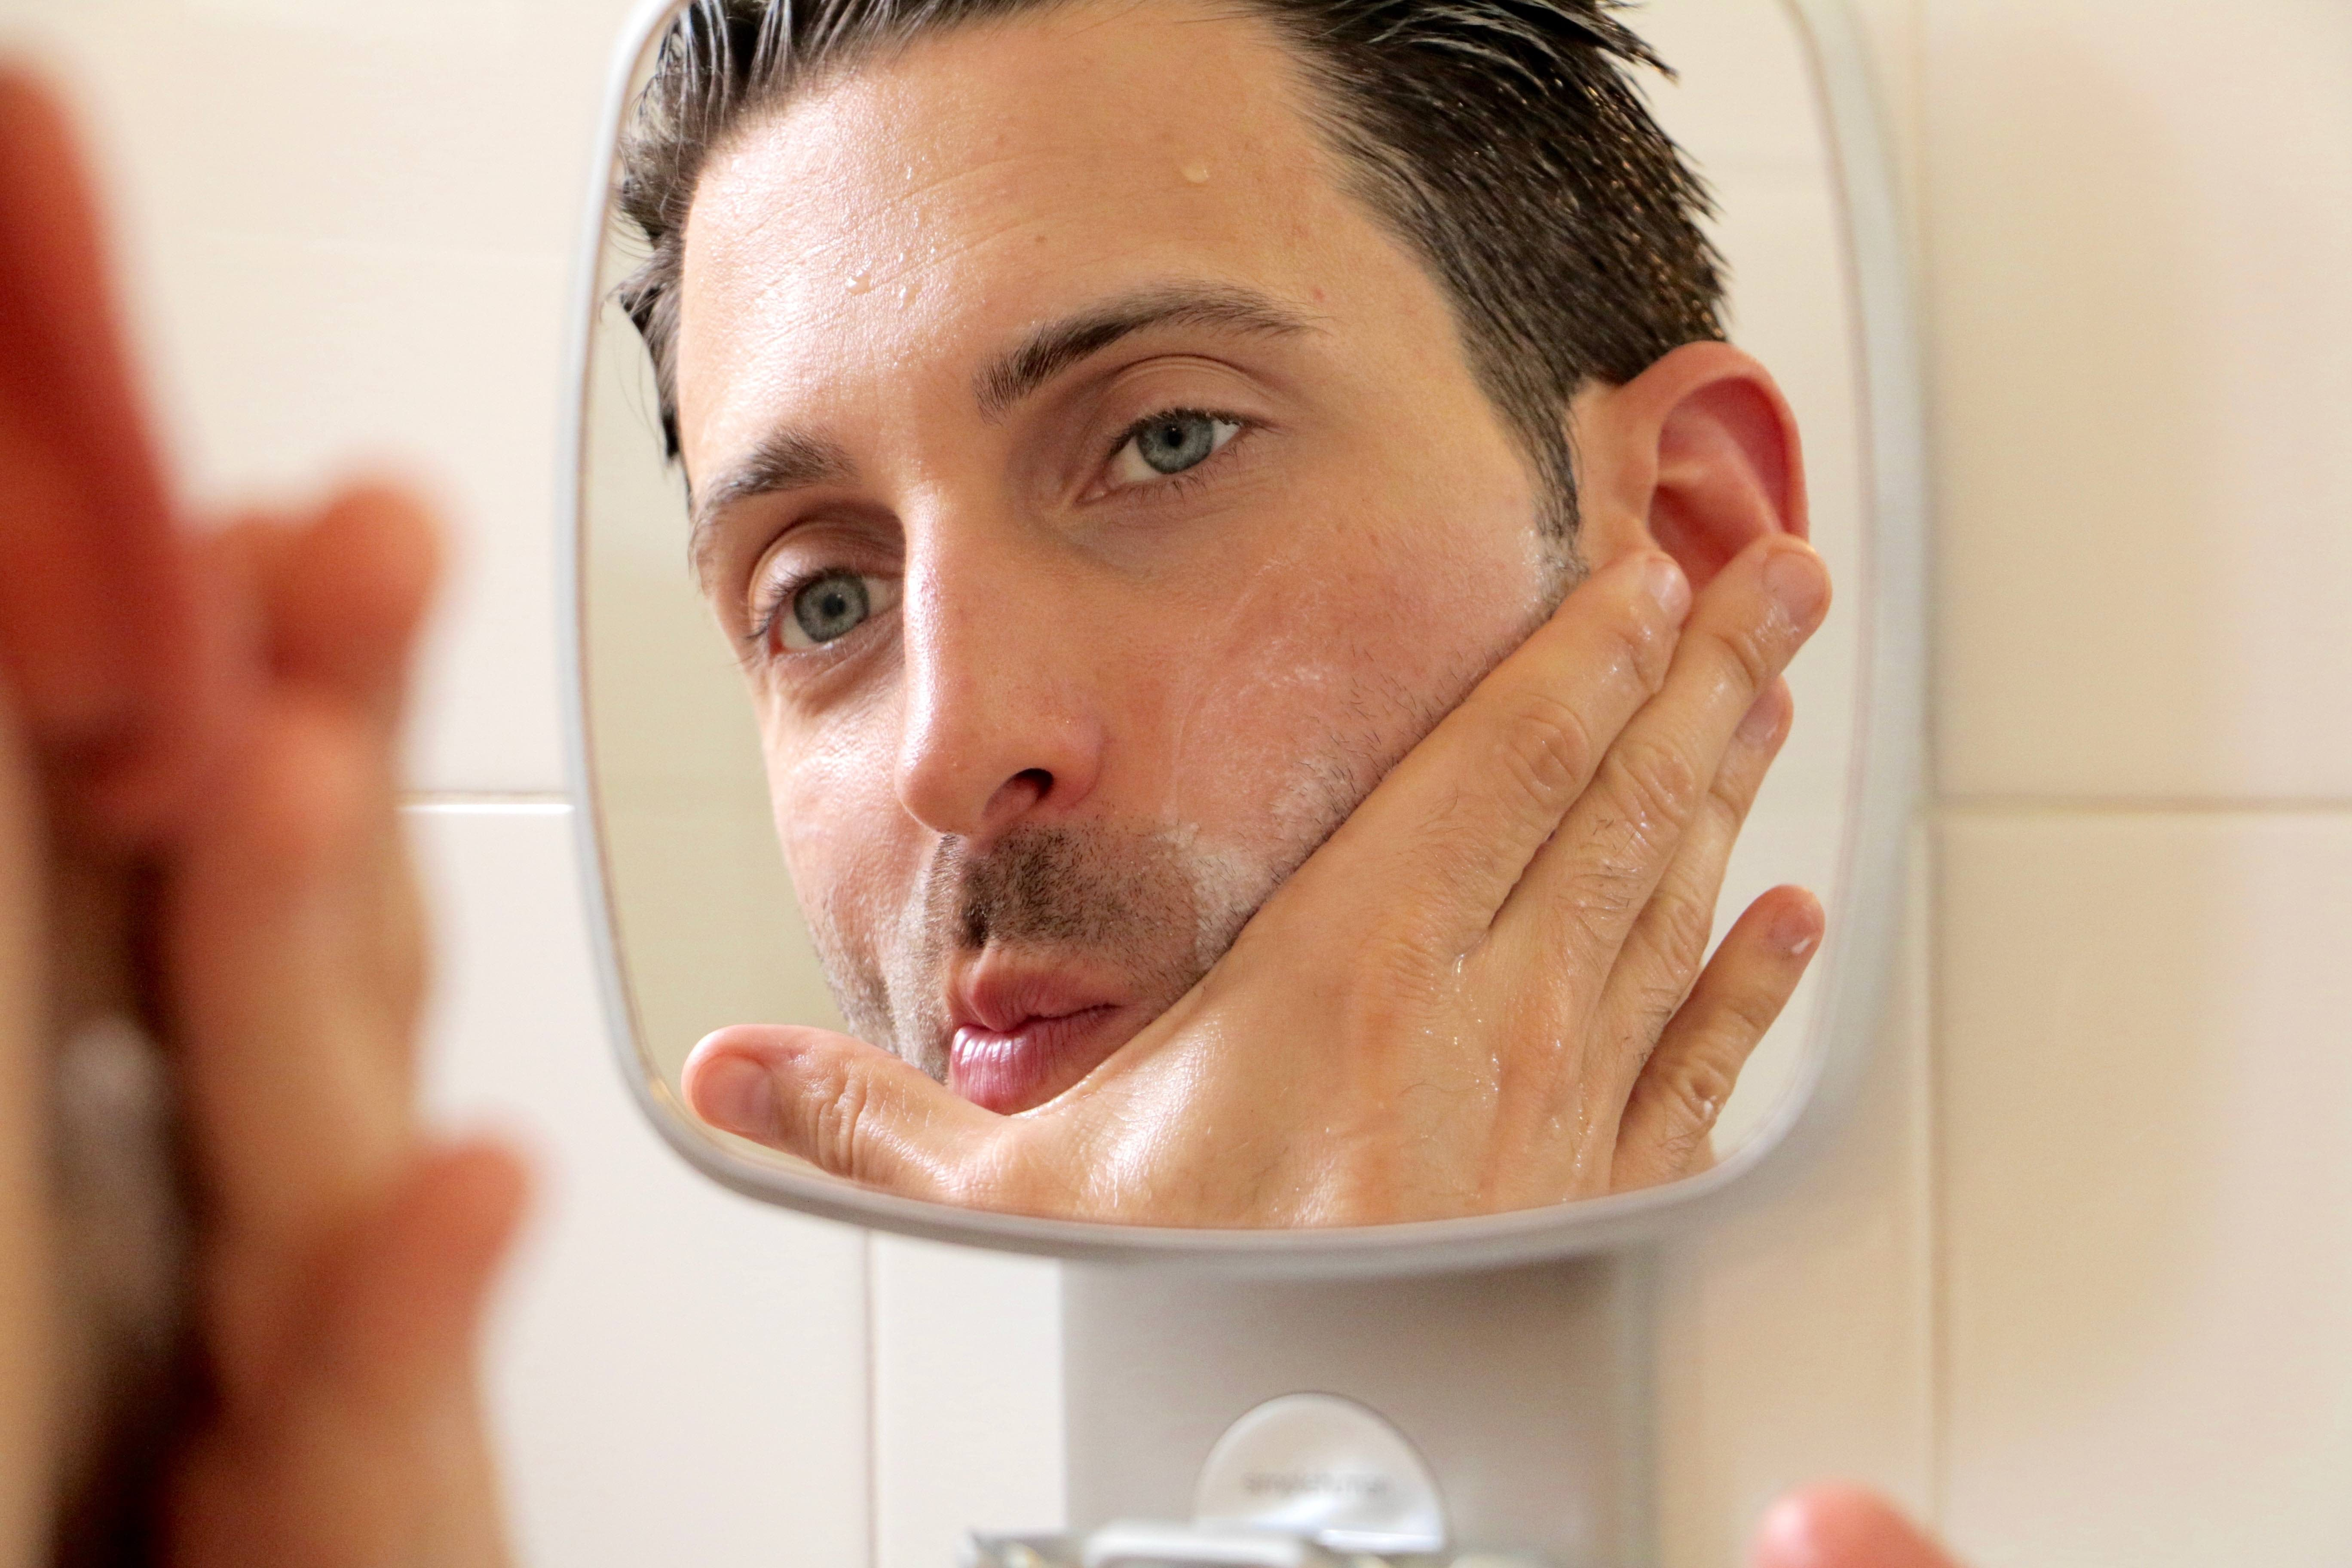 Shaving 10